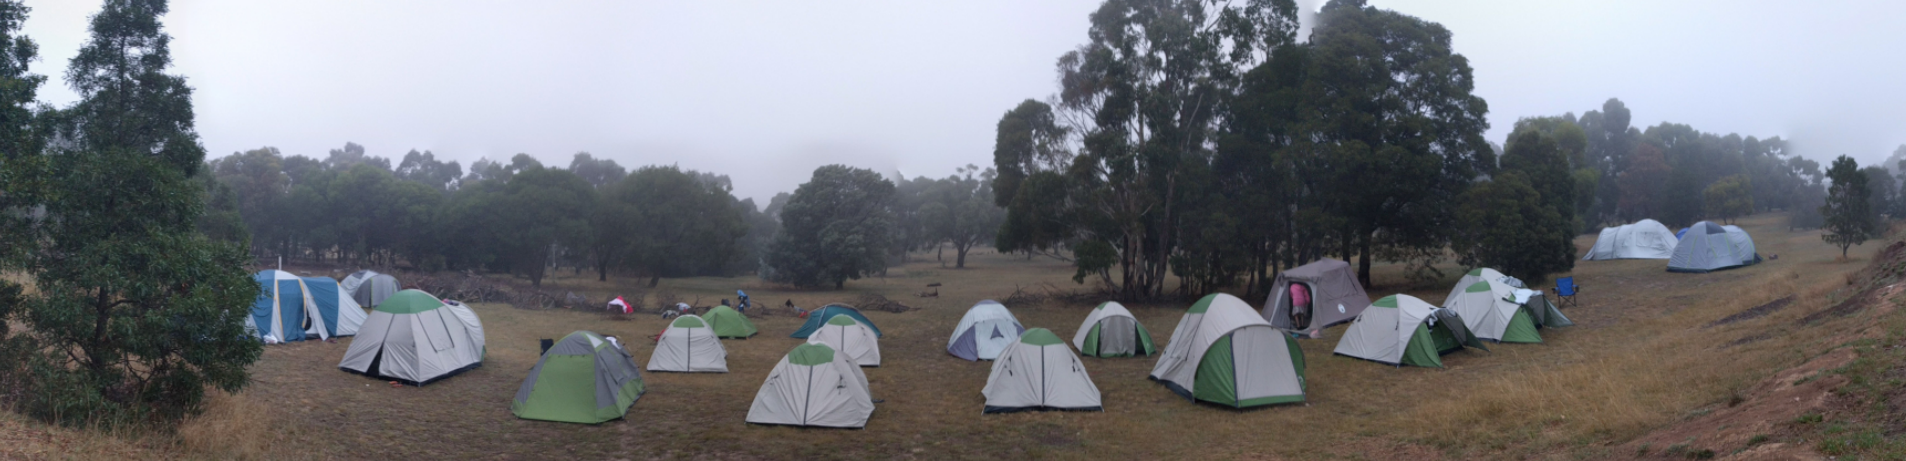 2017-03-26 16_56_37-panorama-fam-camp-2107.jpg - Picasa Photo Viewer